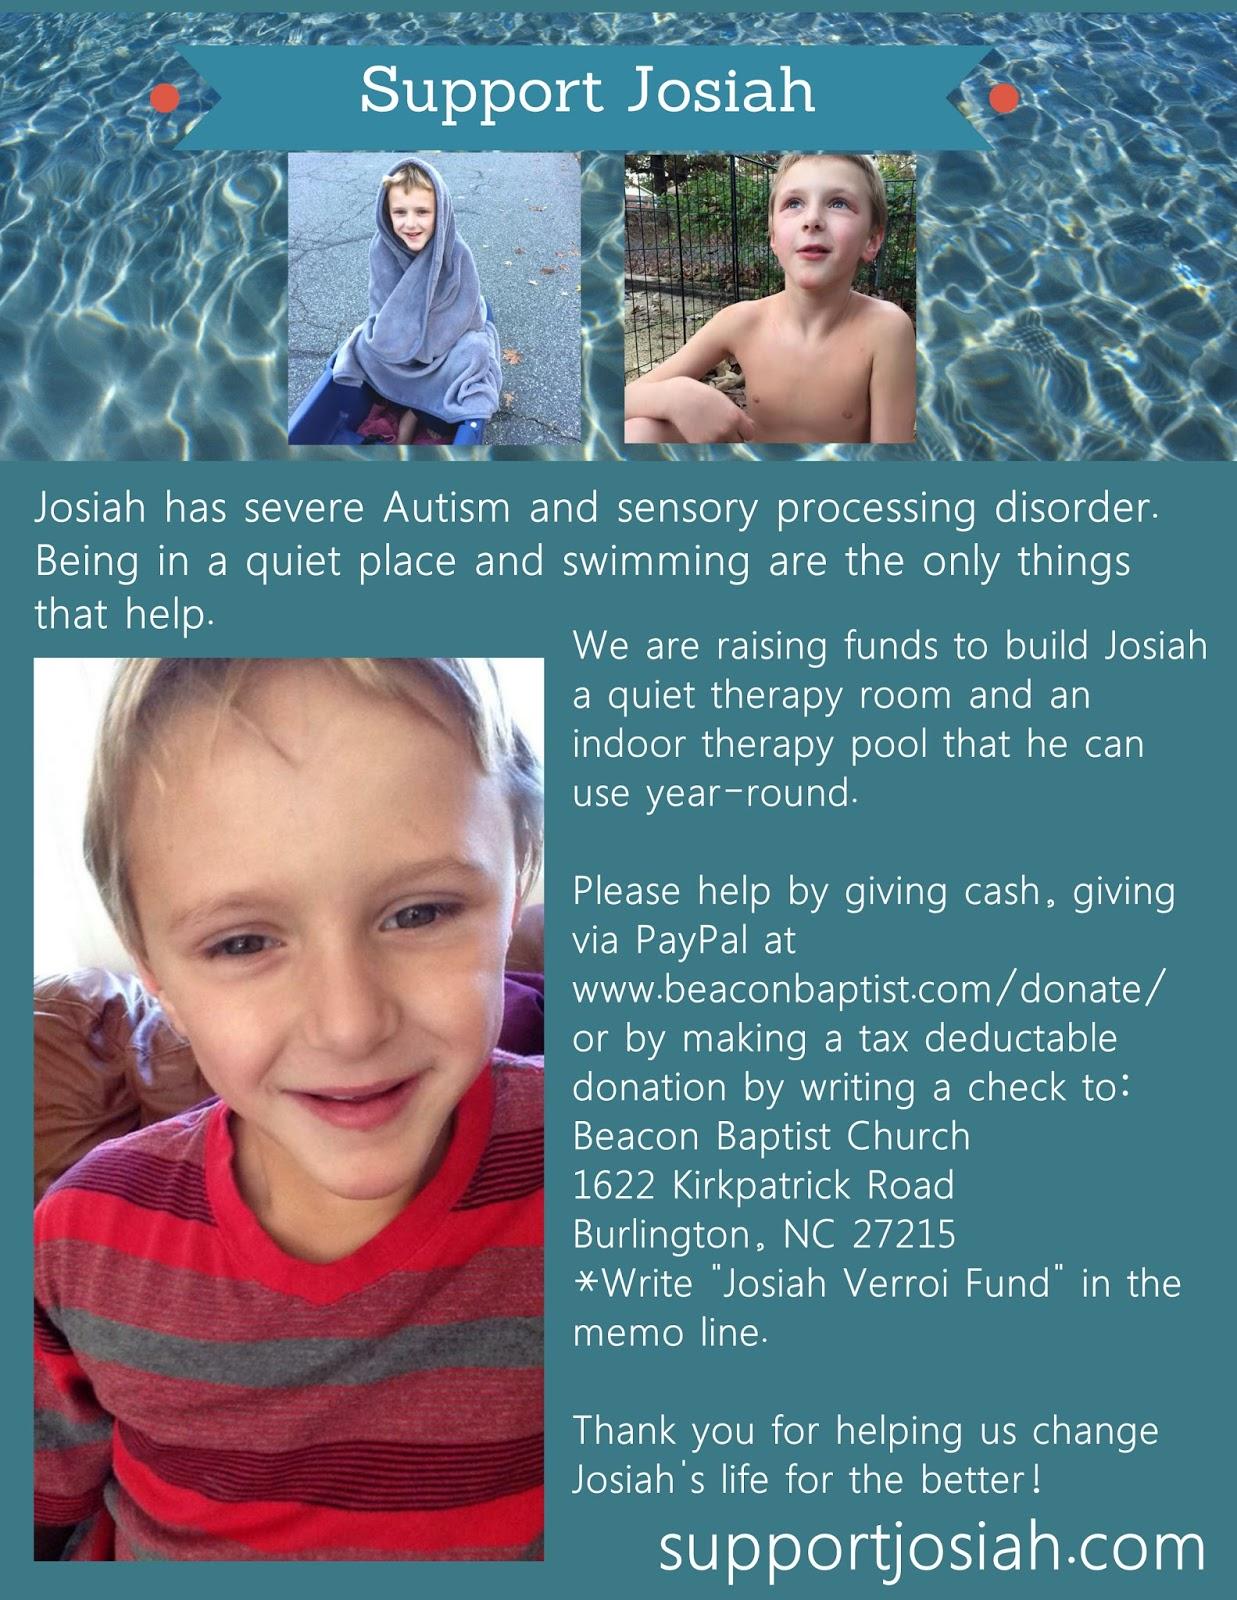 Support Josiah: February 2017